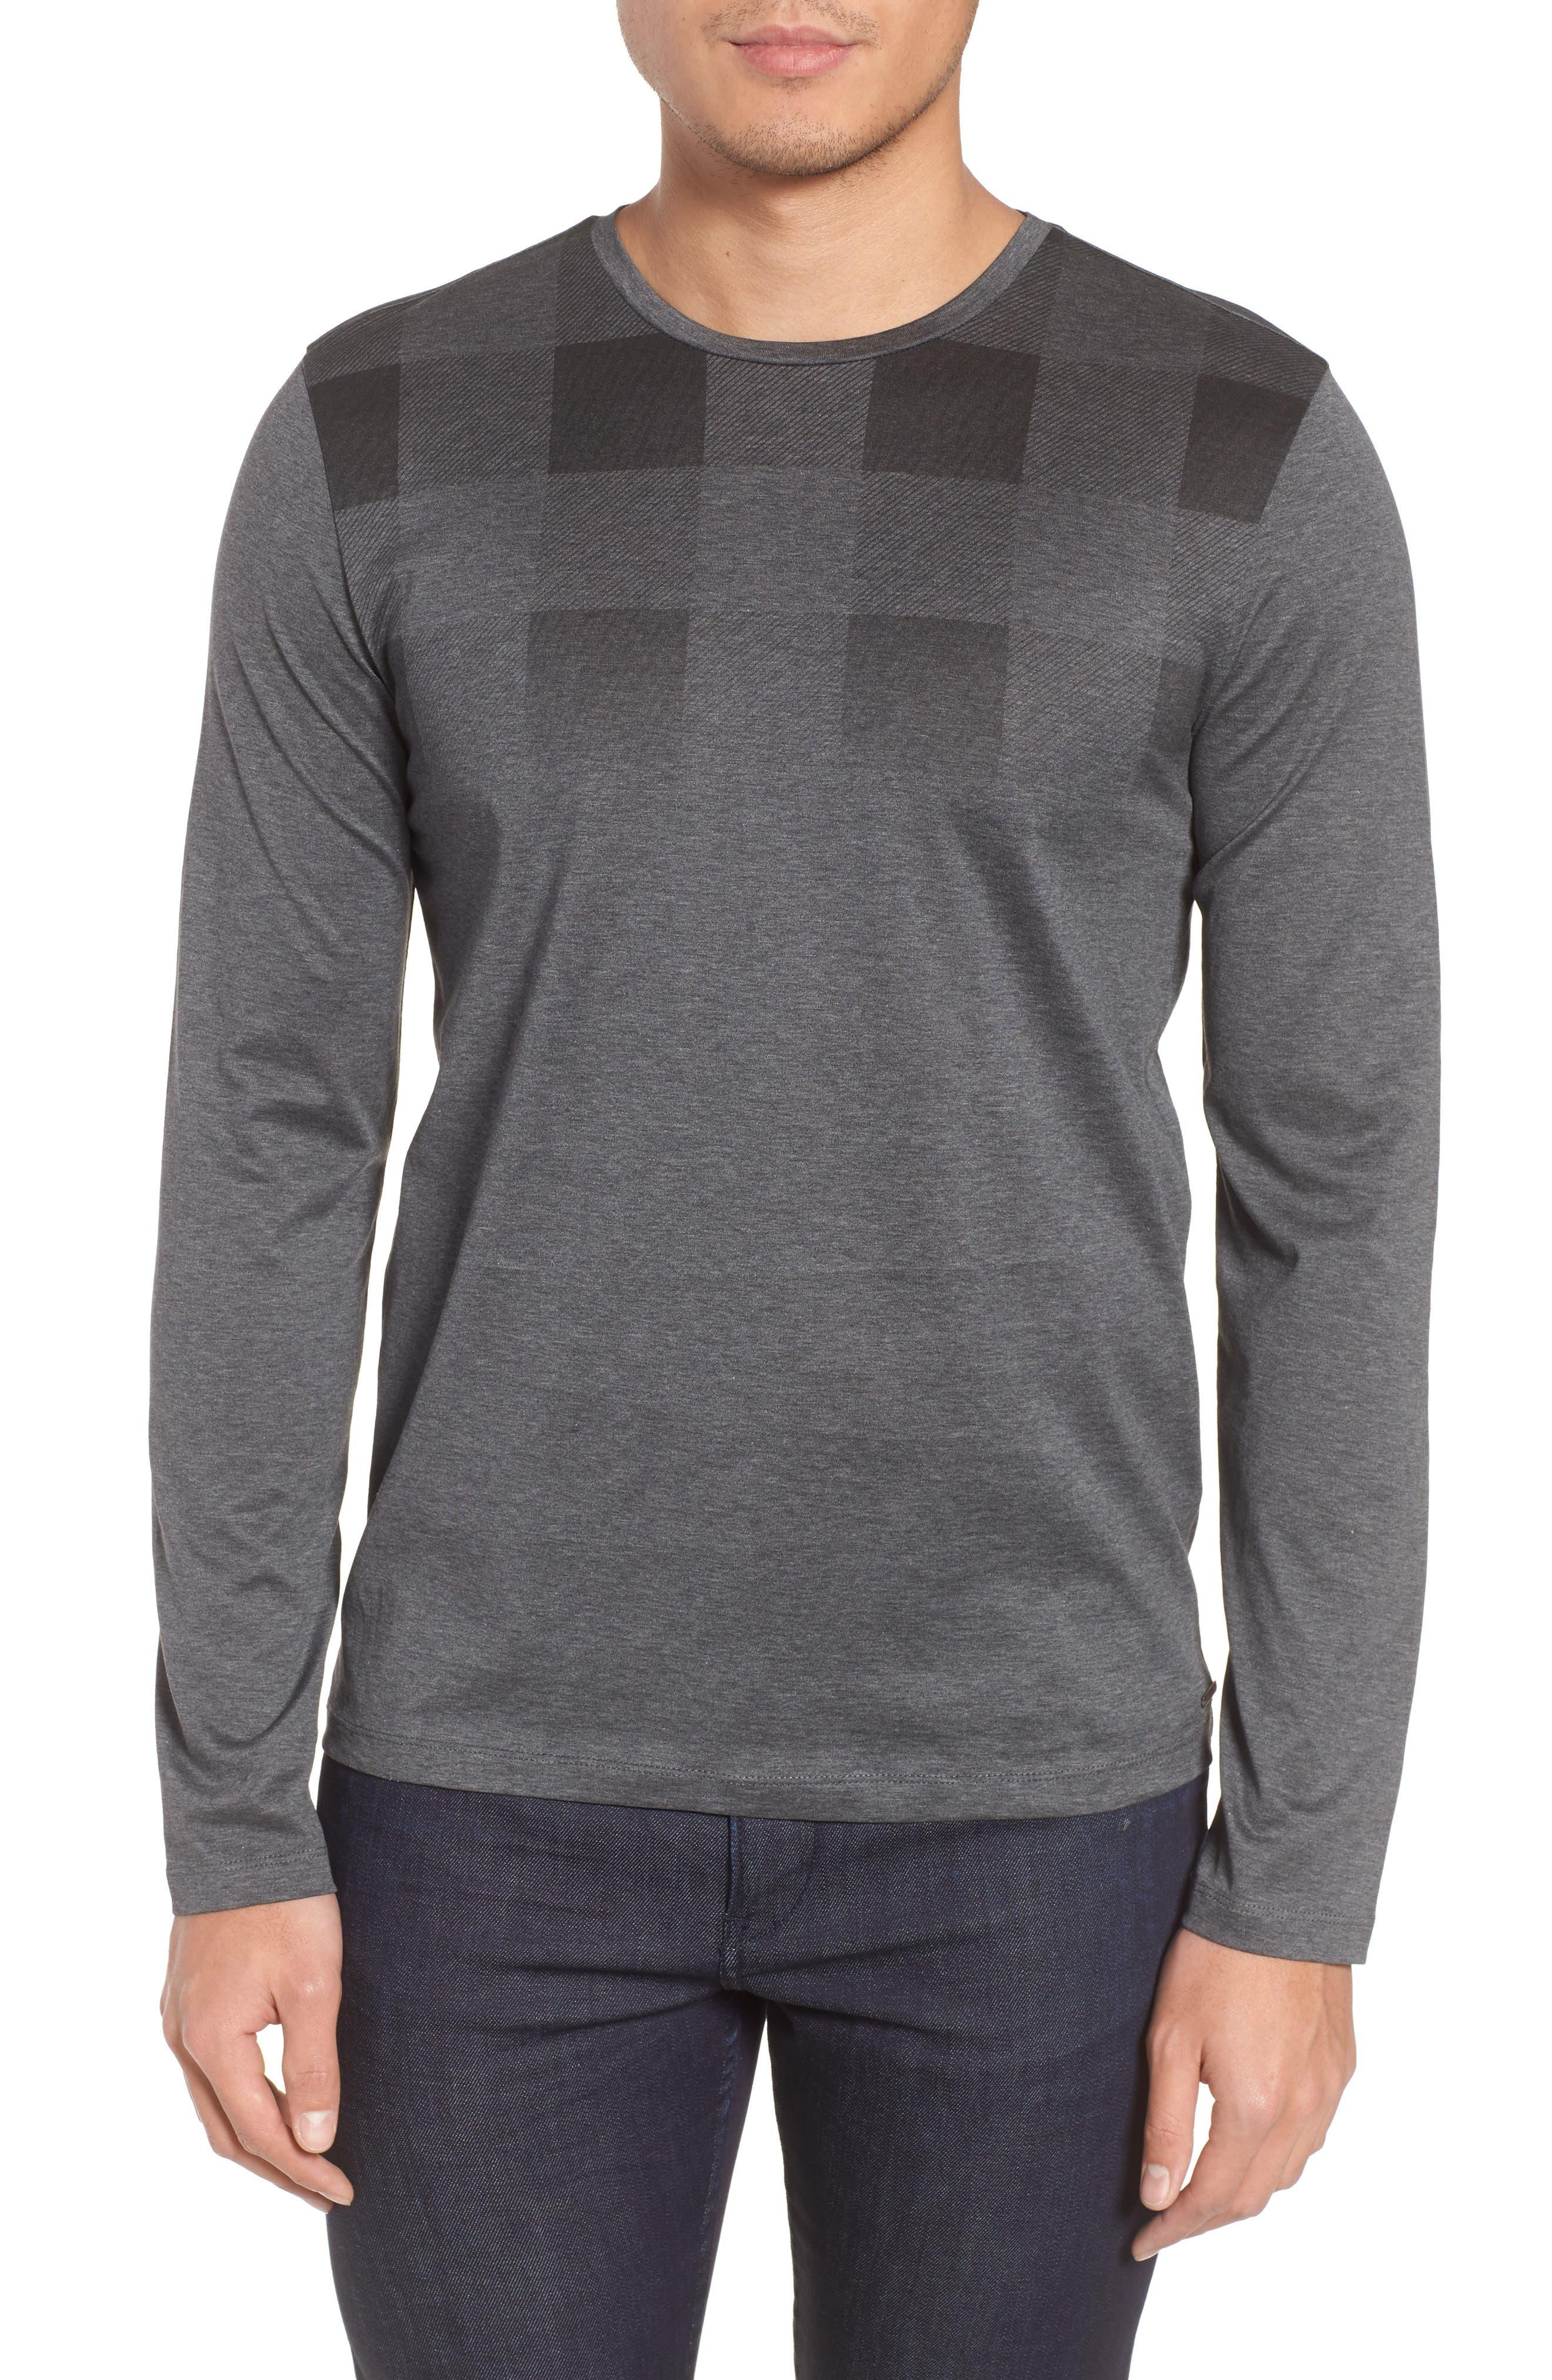 Tenison Slim Fit Ombre Check Long Sleeve T-shirt,                             Main thumbnail 1, color,                             030